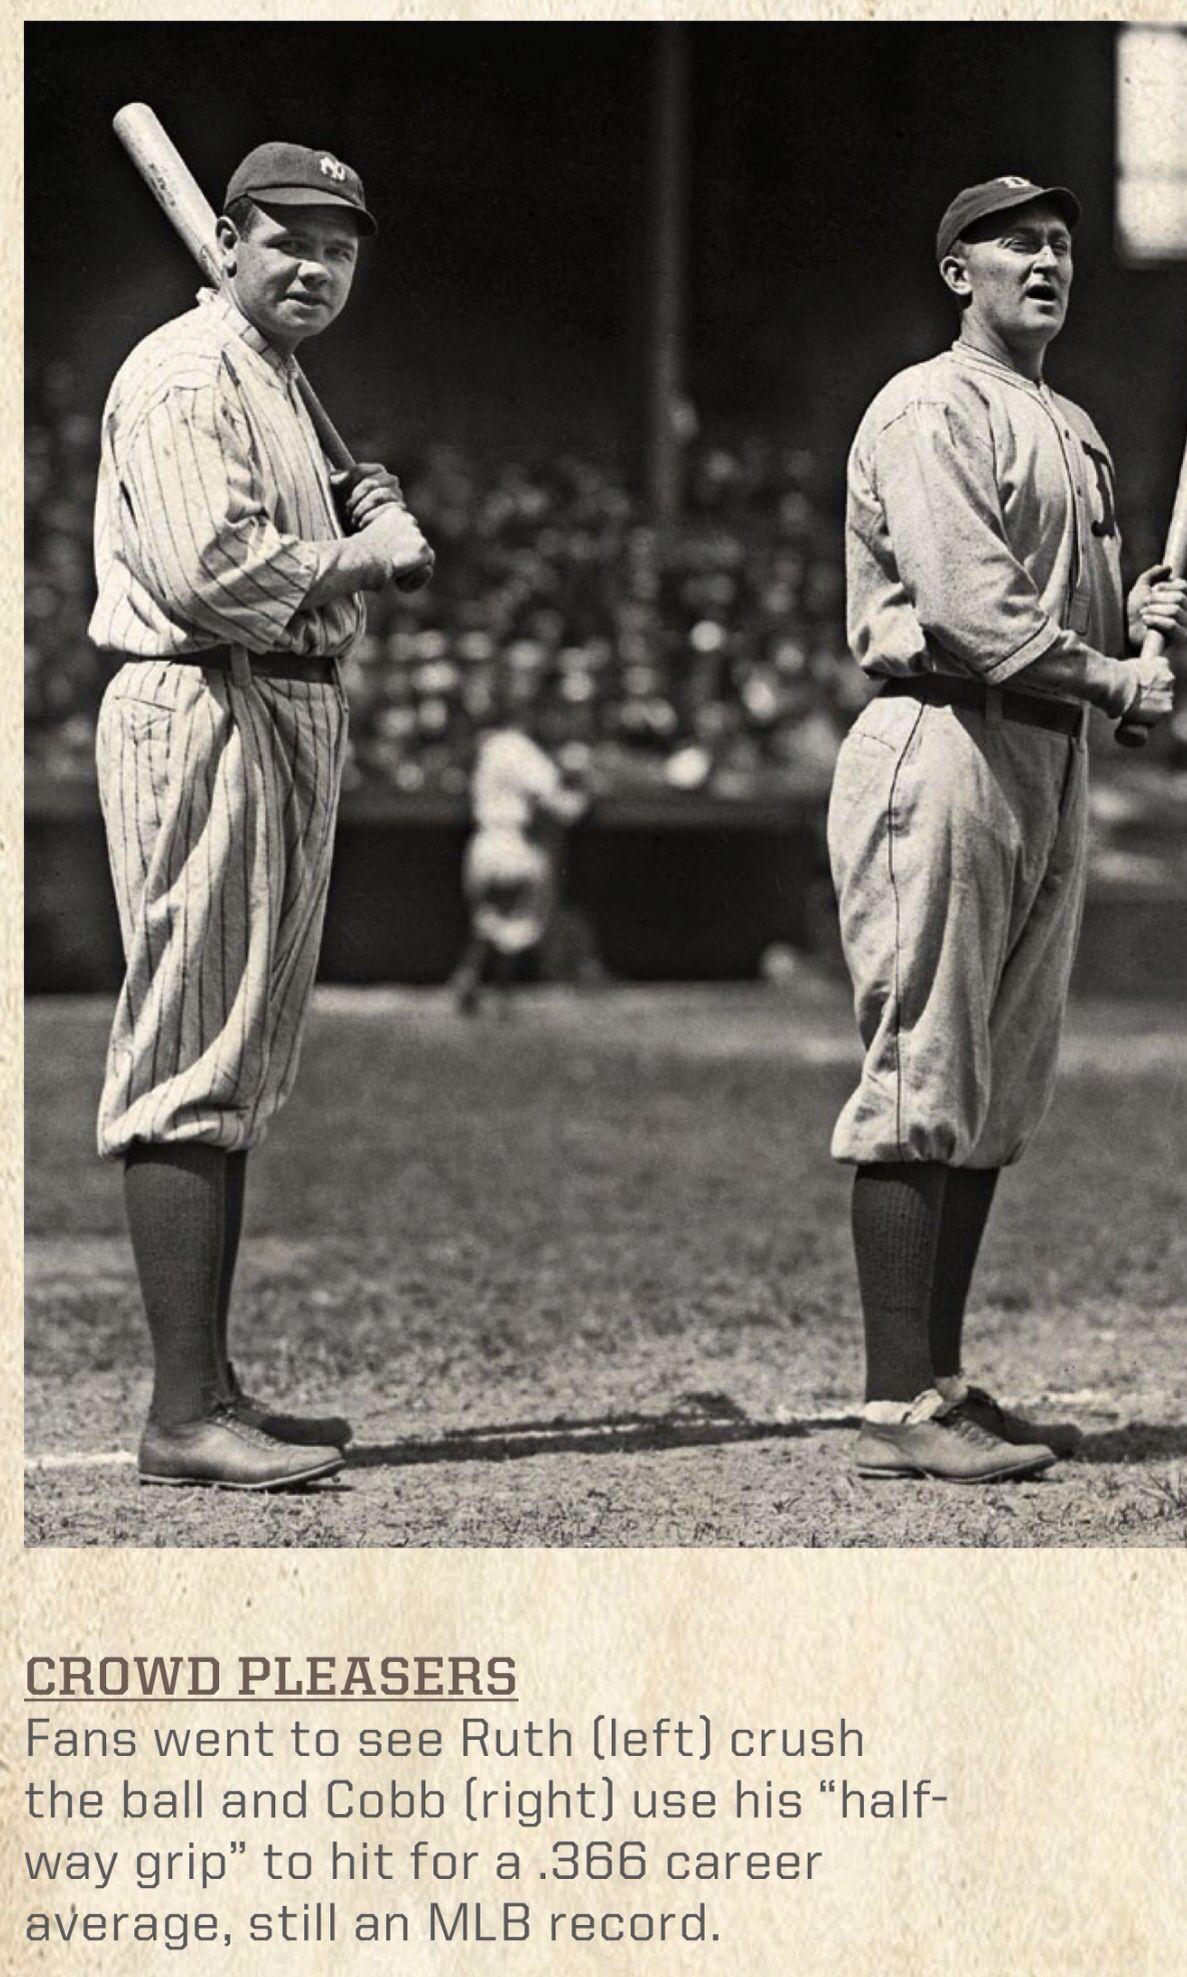 Babe Ruth Ty Cobb Crowd Pleasers Mlb Baseball Baberuth Tycobb Vintage Ty Cobb Babe Ruth Baseball History